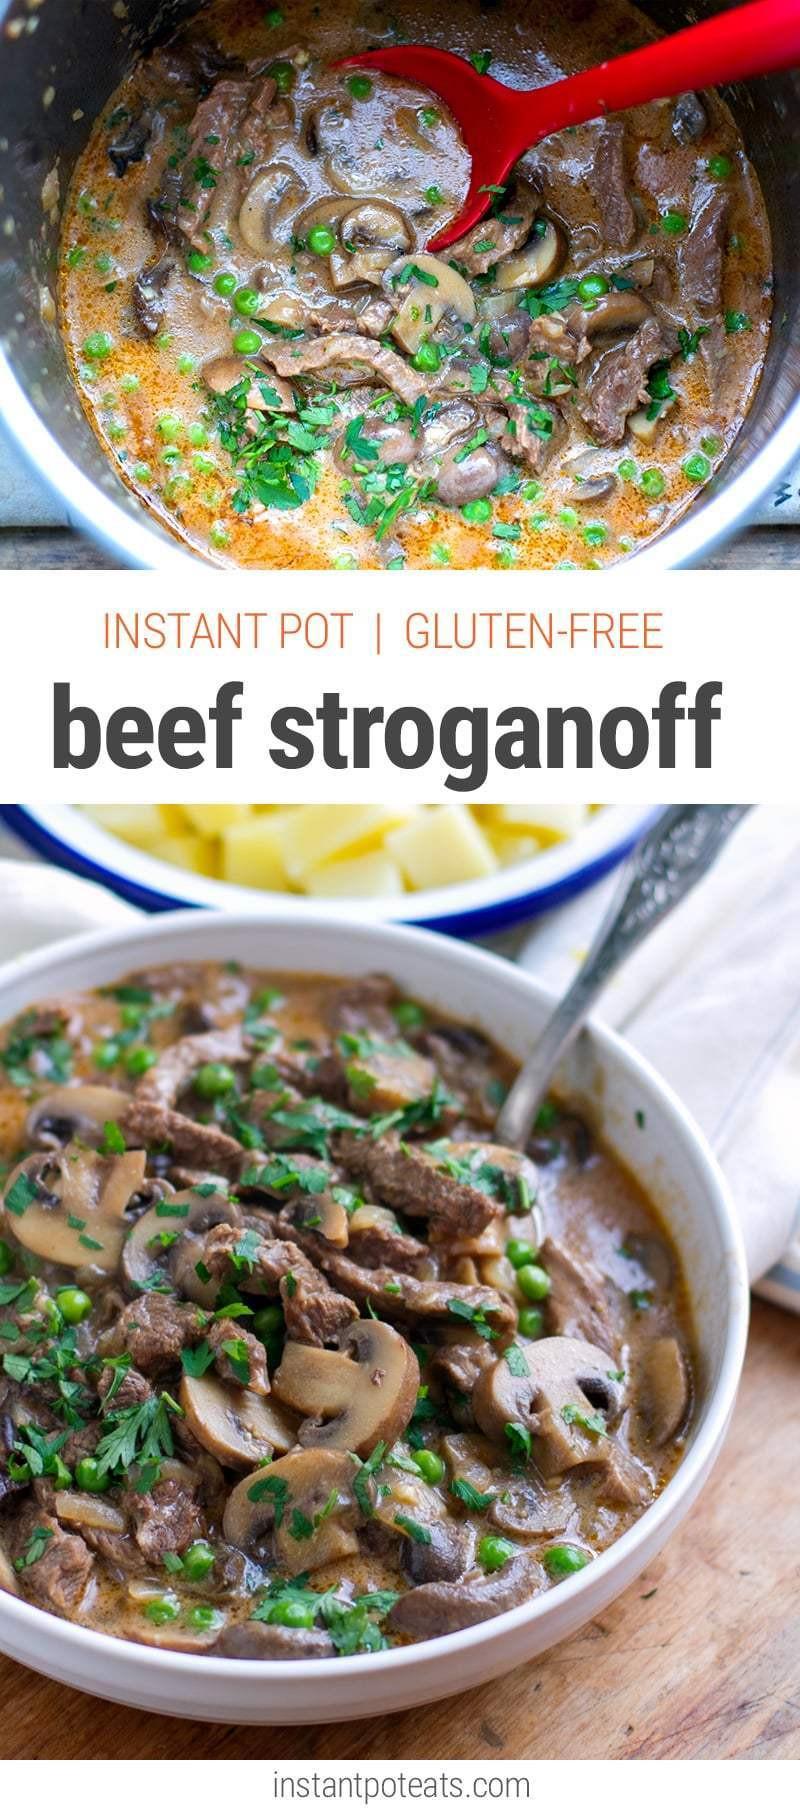 Easy Beef Stroganoff Recipe  Quick & Easy Beef Stroganoff Instant Pot Recipe Gluten